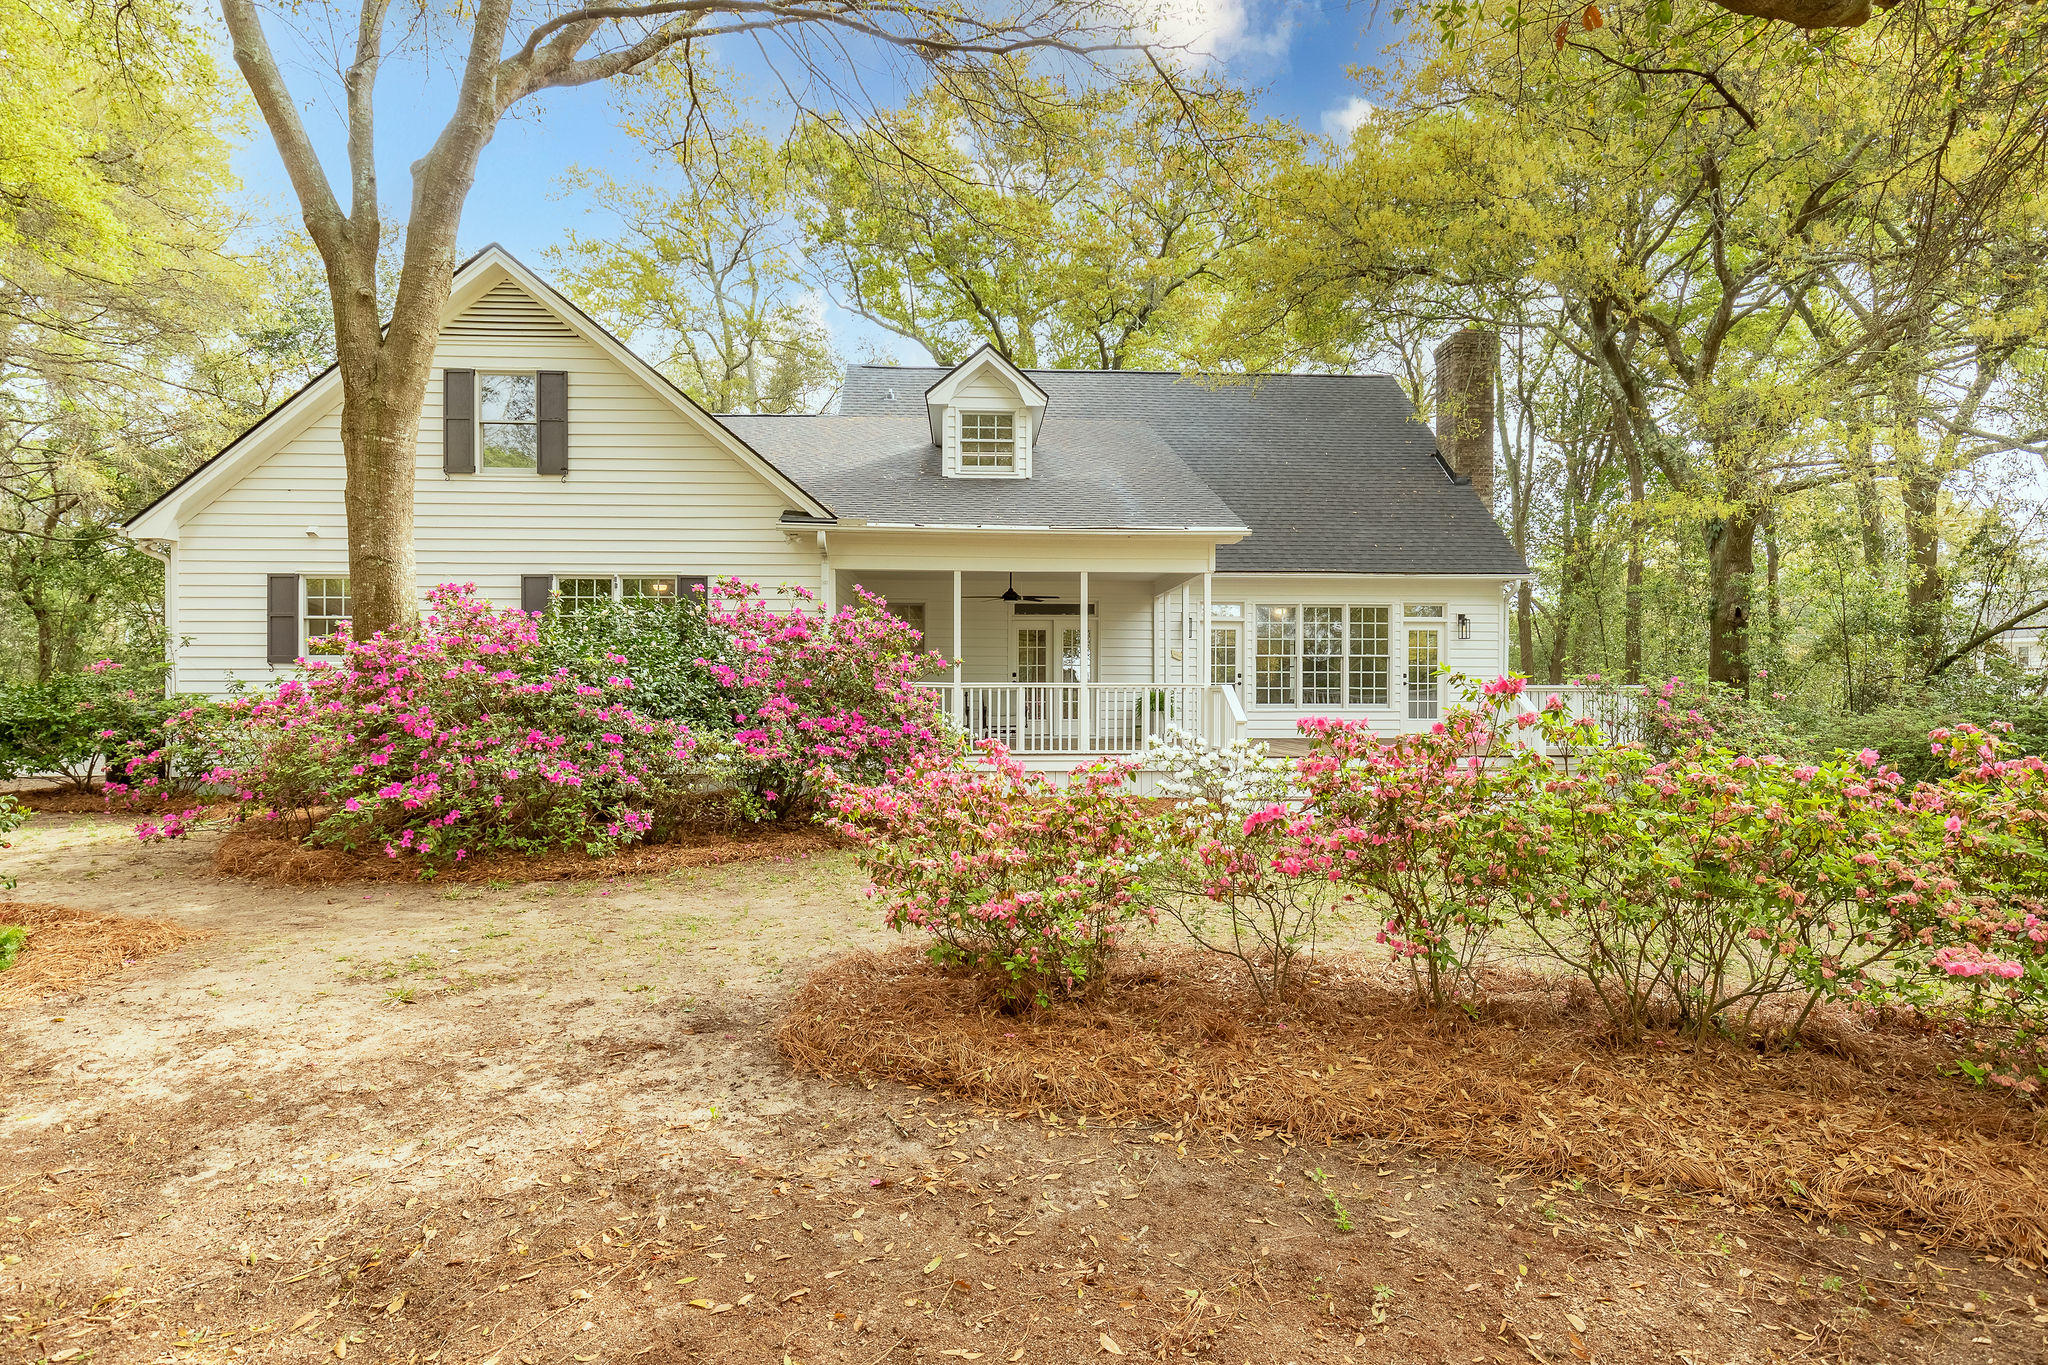 Old Mt Pleasant Homes For Sale - 1417 Edwards, Mount Pleasant, SC - 45